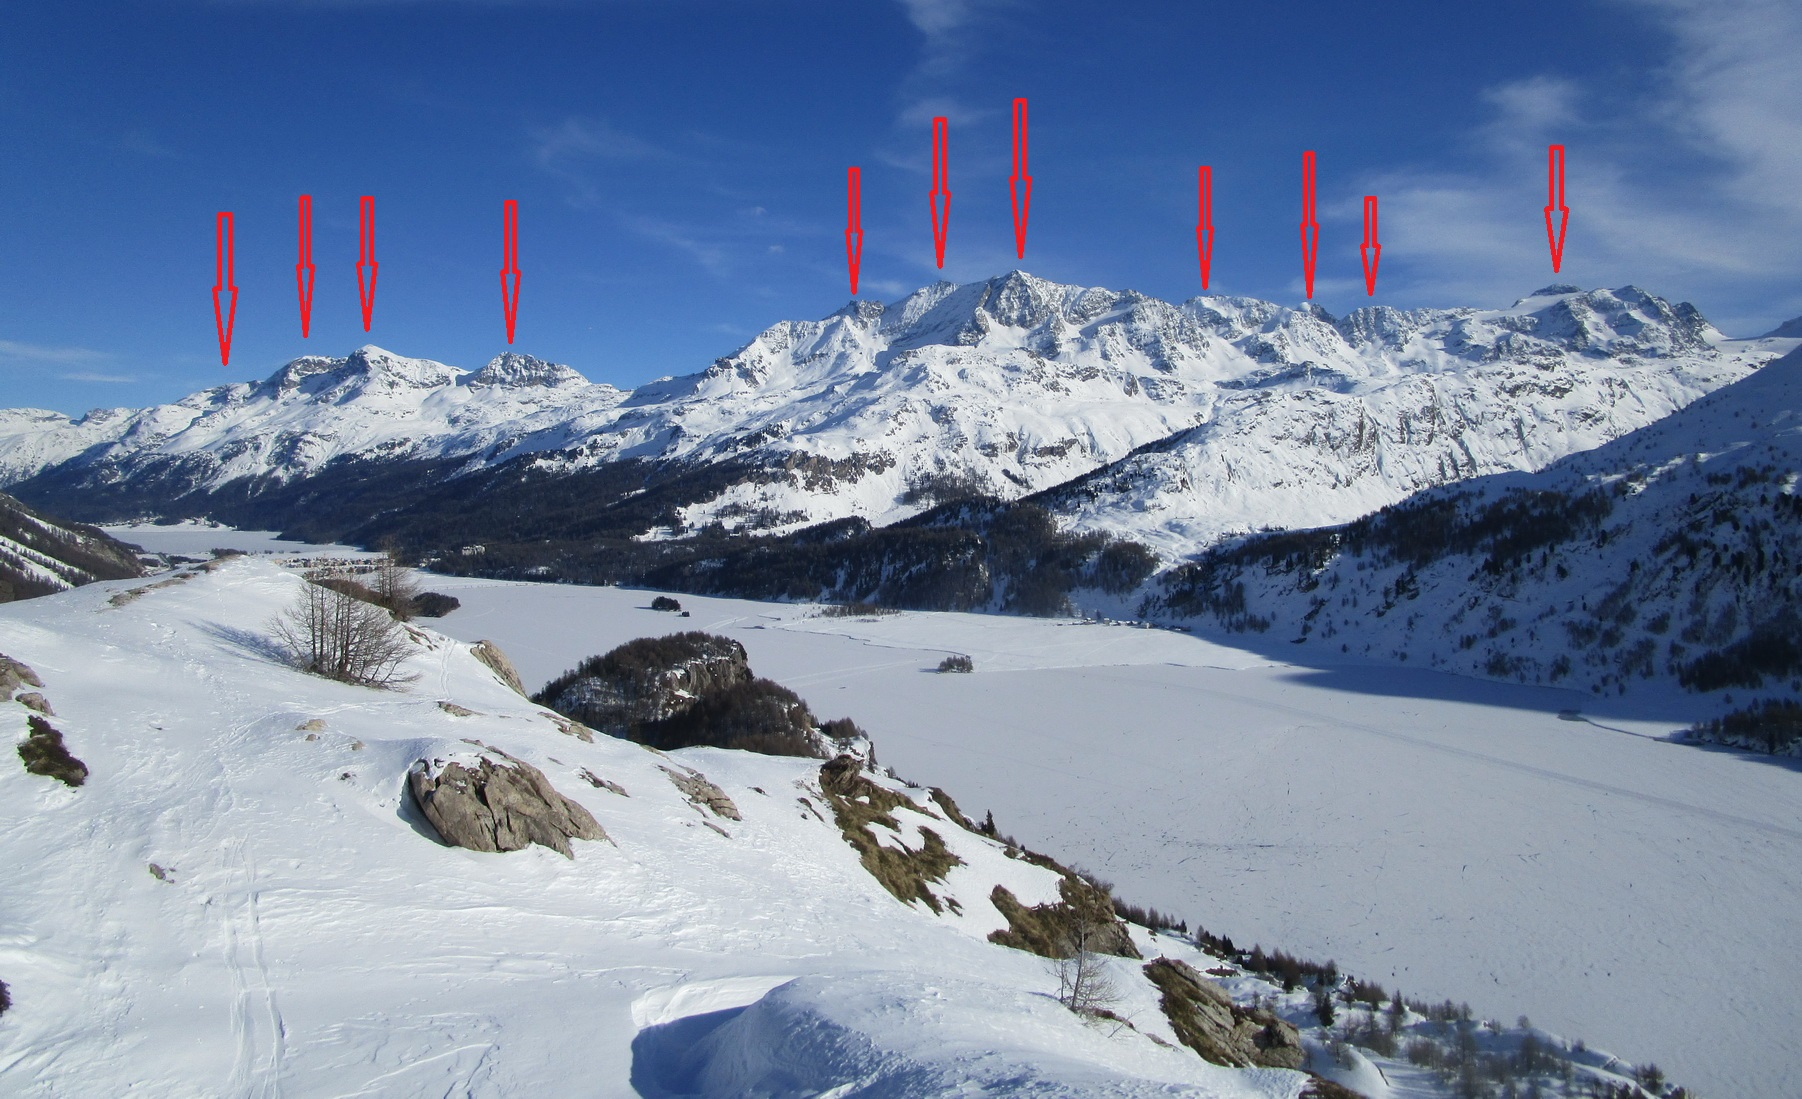 zľava:_Mezdi,_San_Gian,_Surlej,_Arlas,_Corvatsch_Bergstation,_Murtel,_Corvatsch,_Sgrischus,_Roseg,_Piz_Lei_da_Alv,_Caputschin